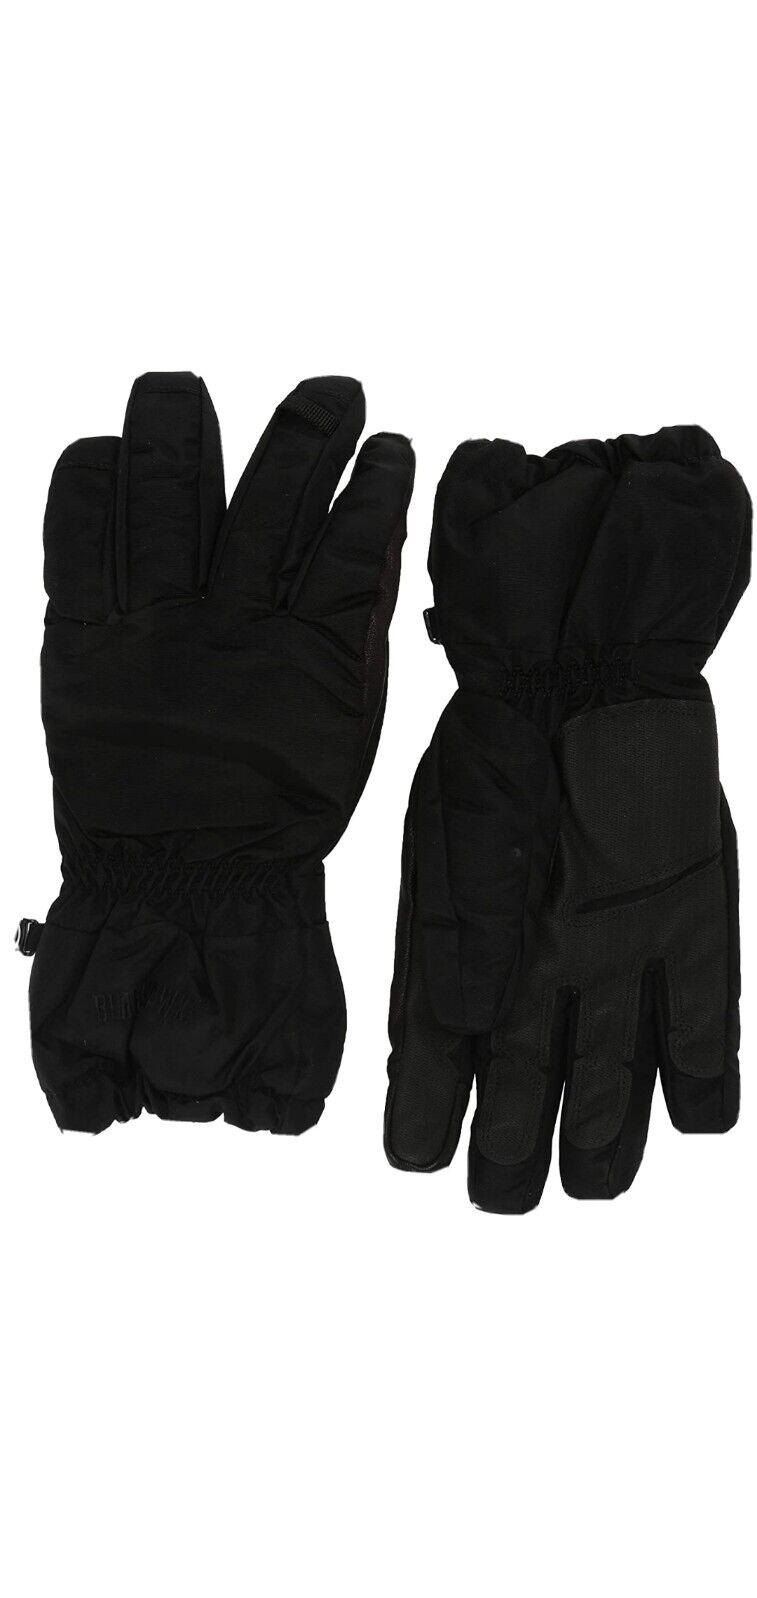 BlackHawk ECW2 Winter Operations Glove 8086MDBK Authentic Blackhawk XLarge